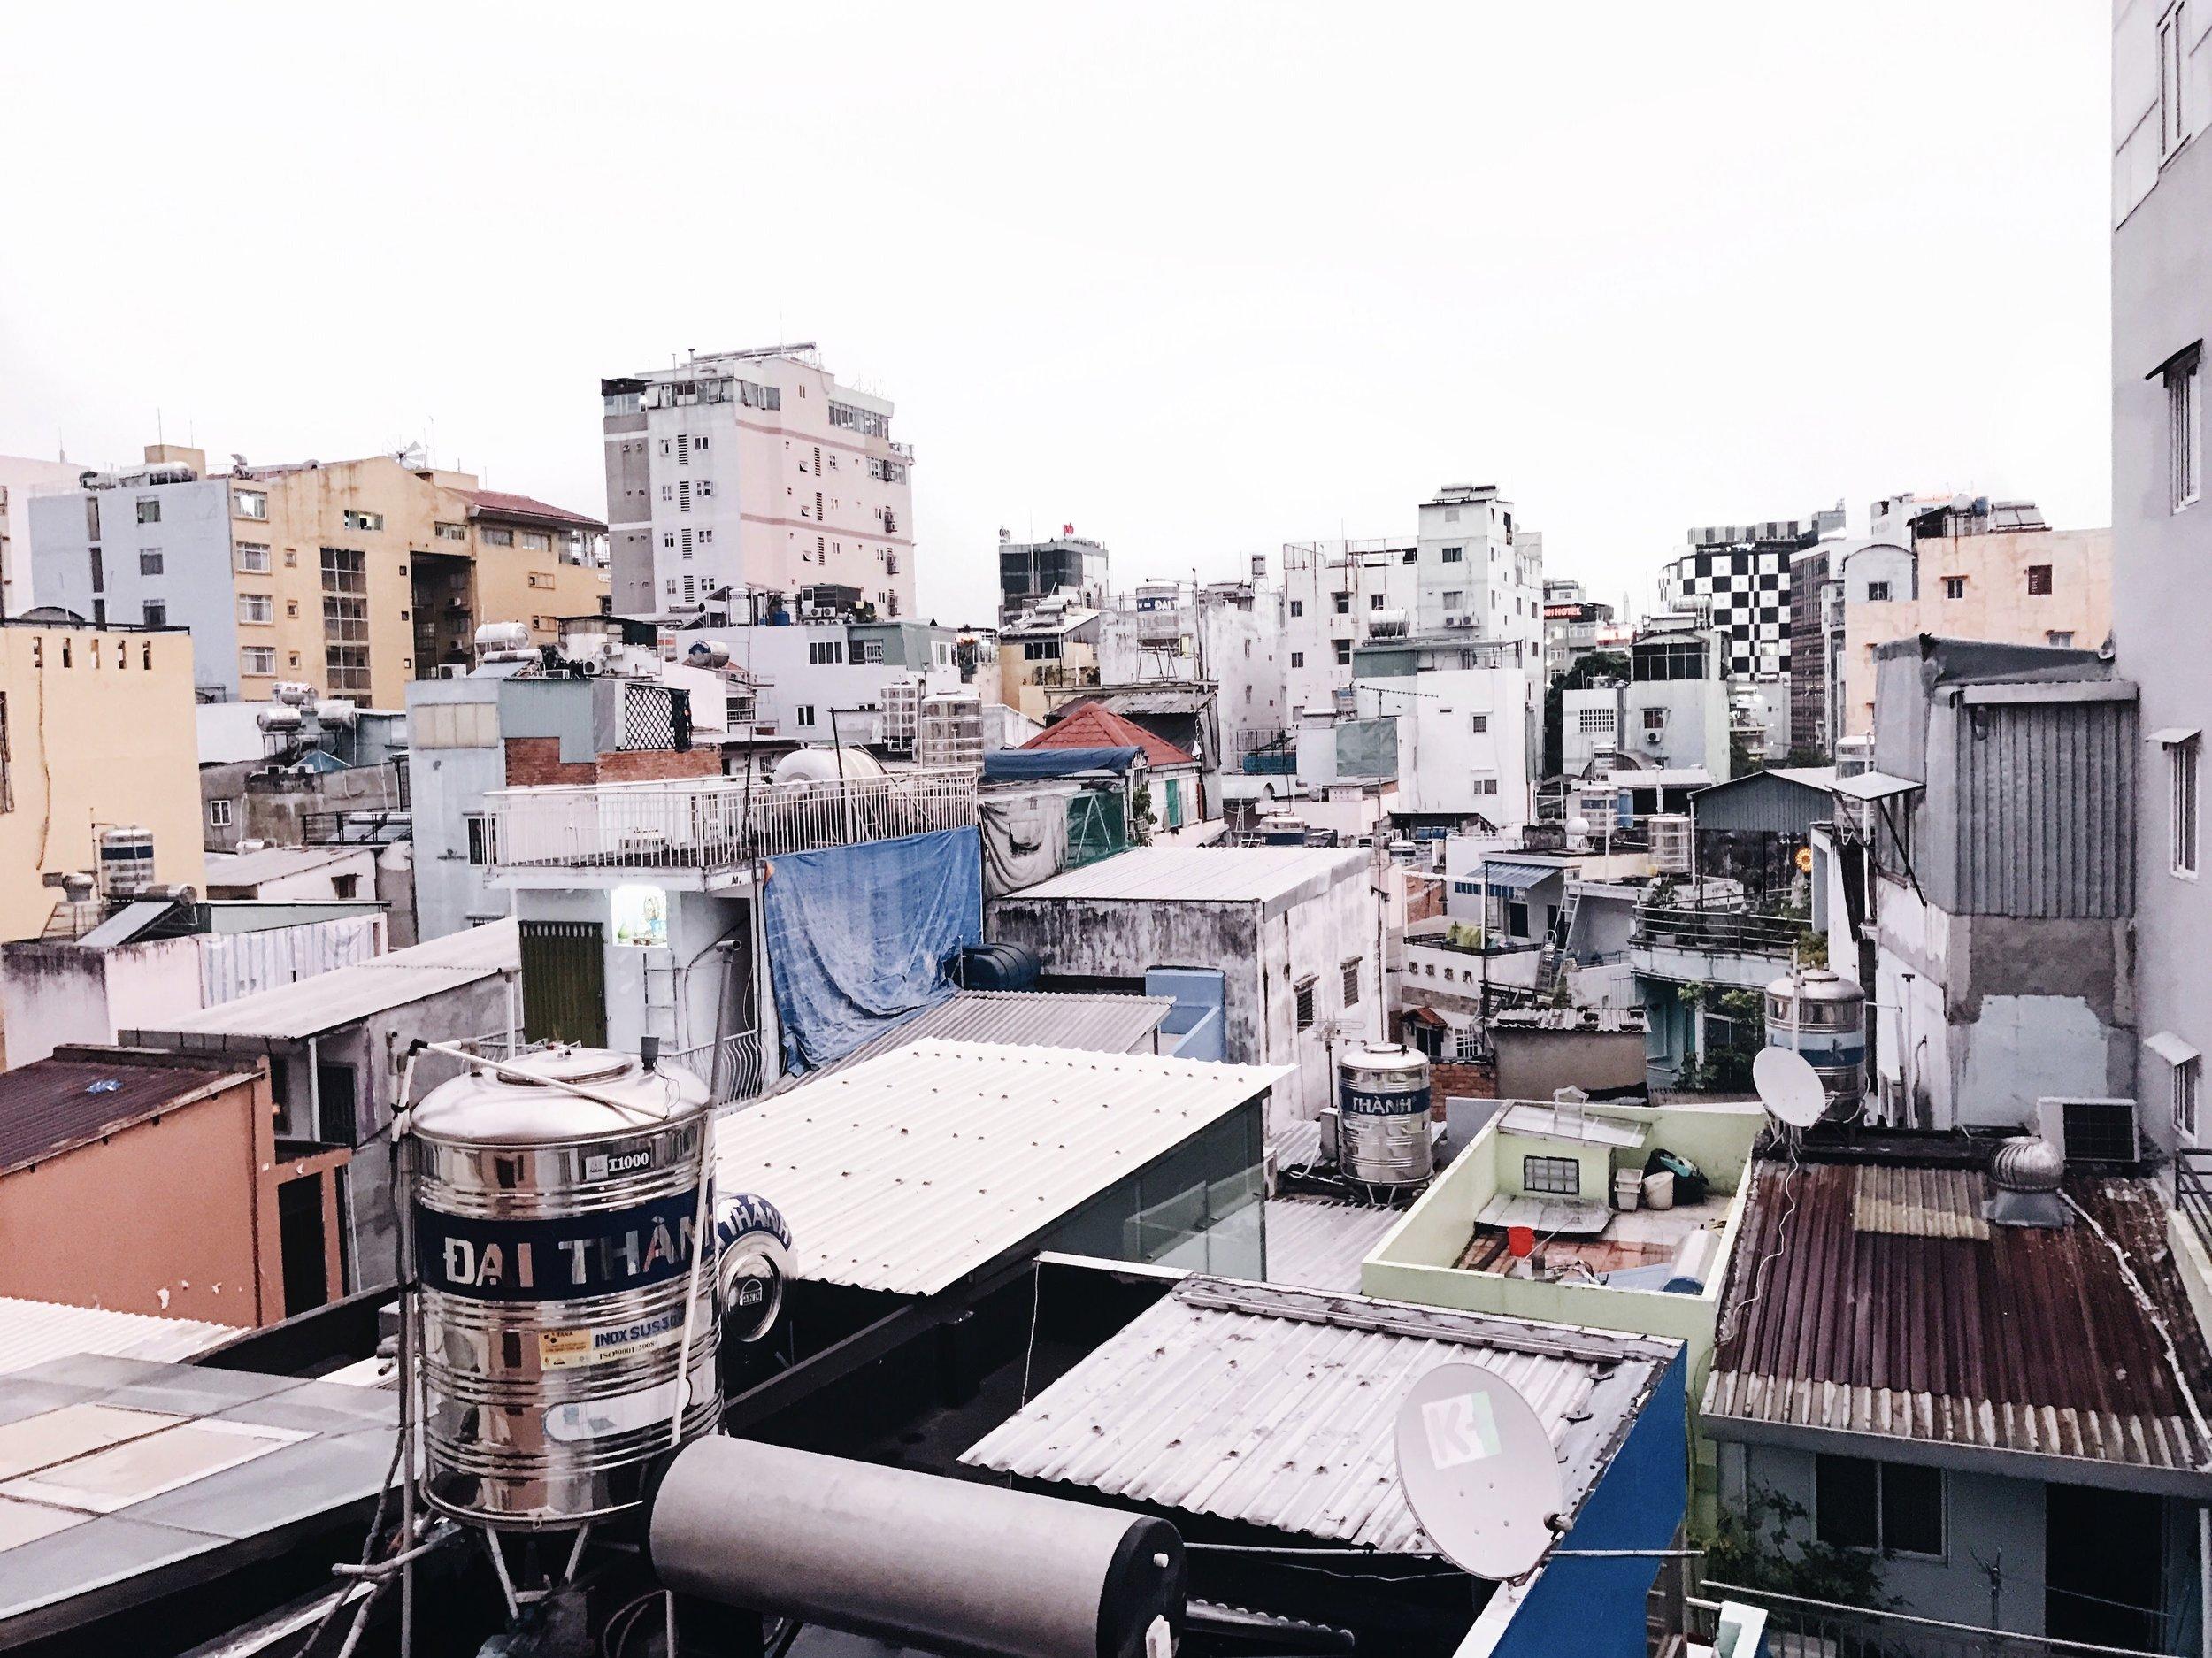 Image: Ho Chi Minh City - Saigon Rooftops